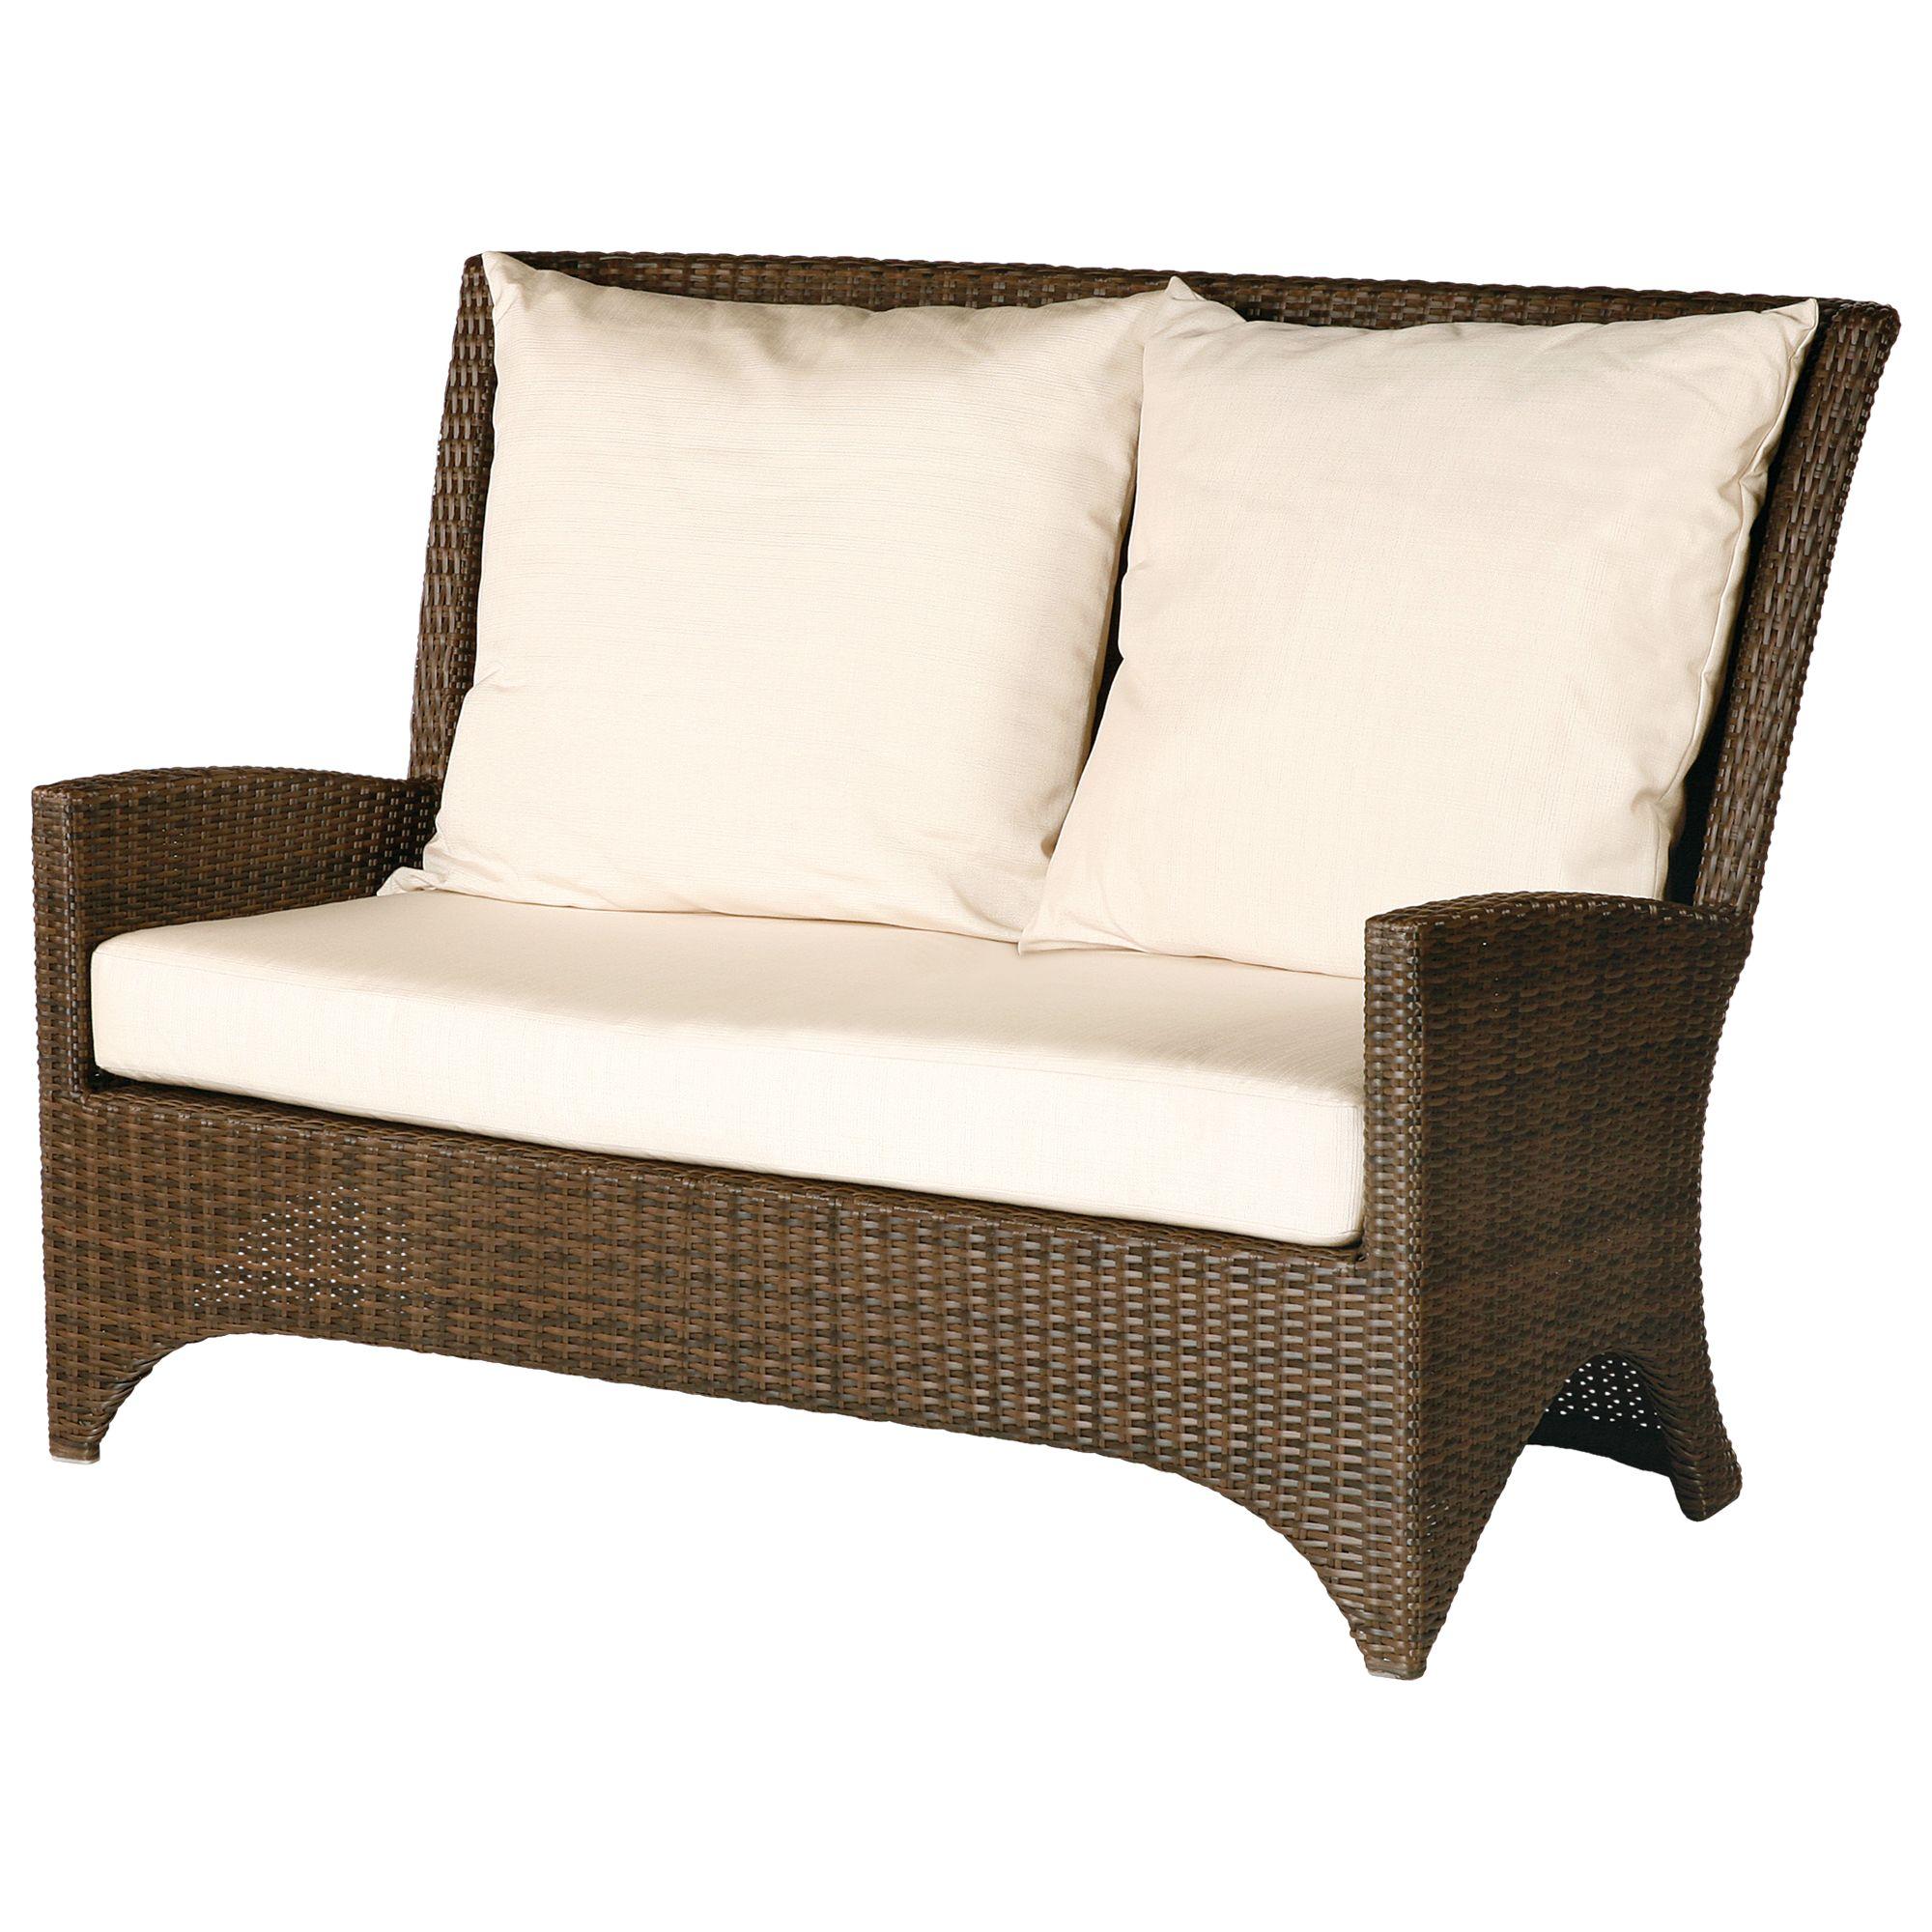 Barlow Tyrie Savannah 2 Seater Outdoor Sofa, Natural